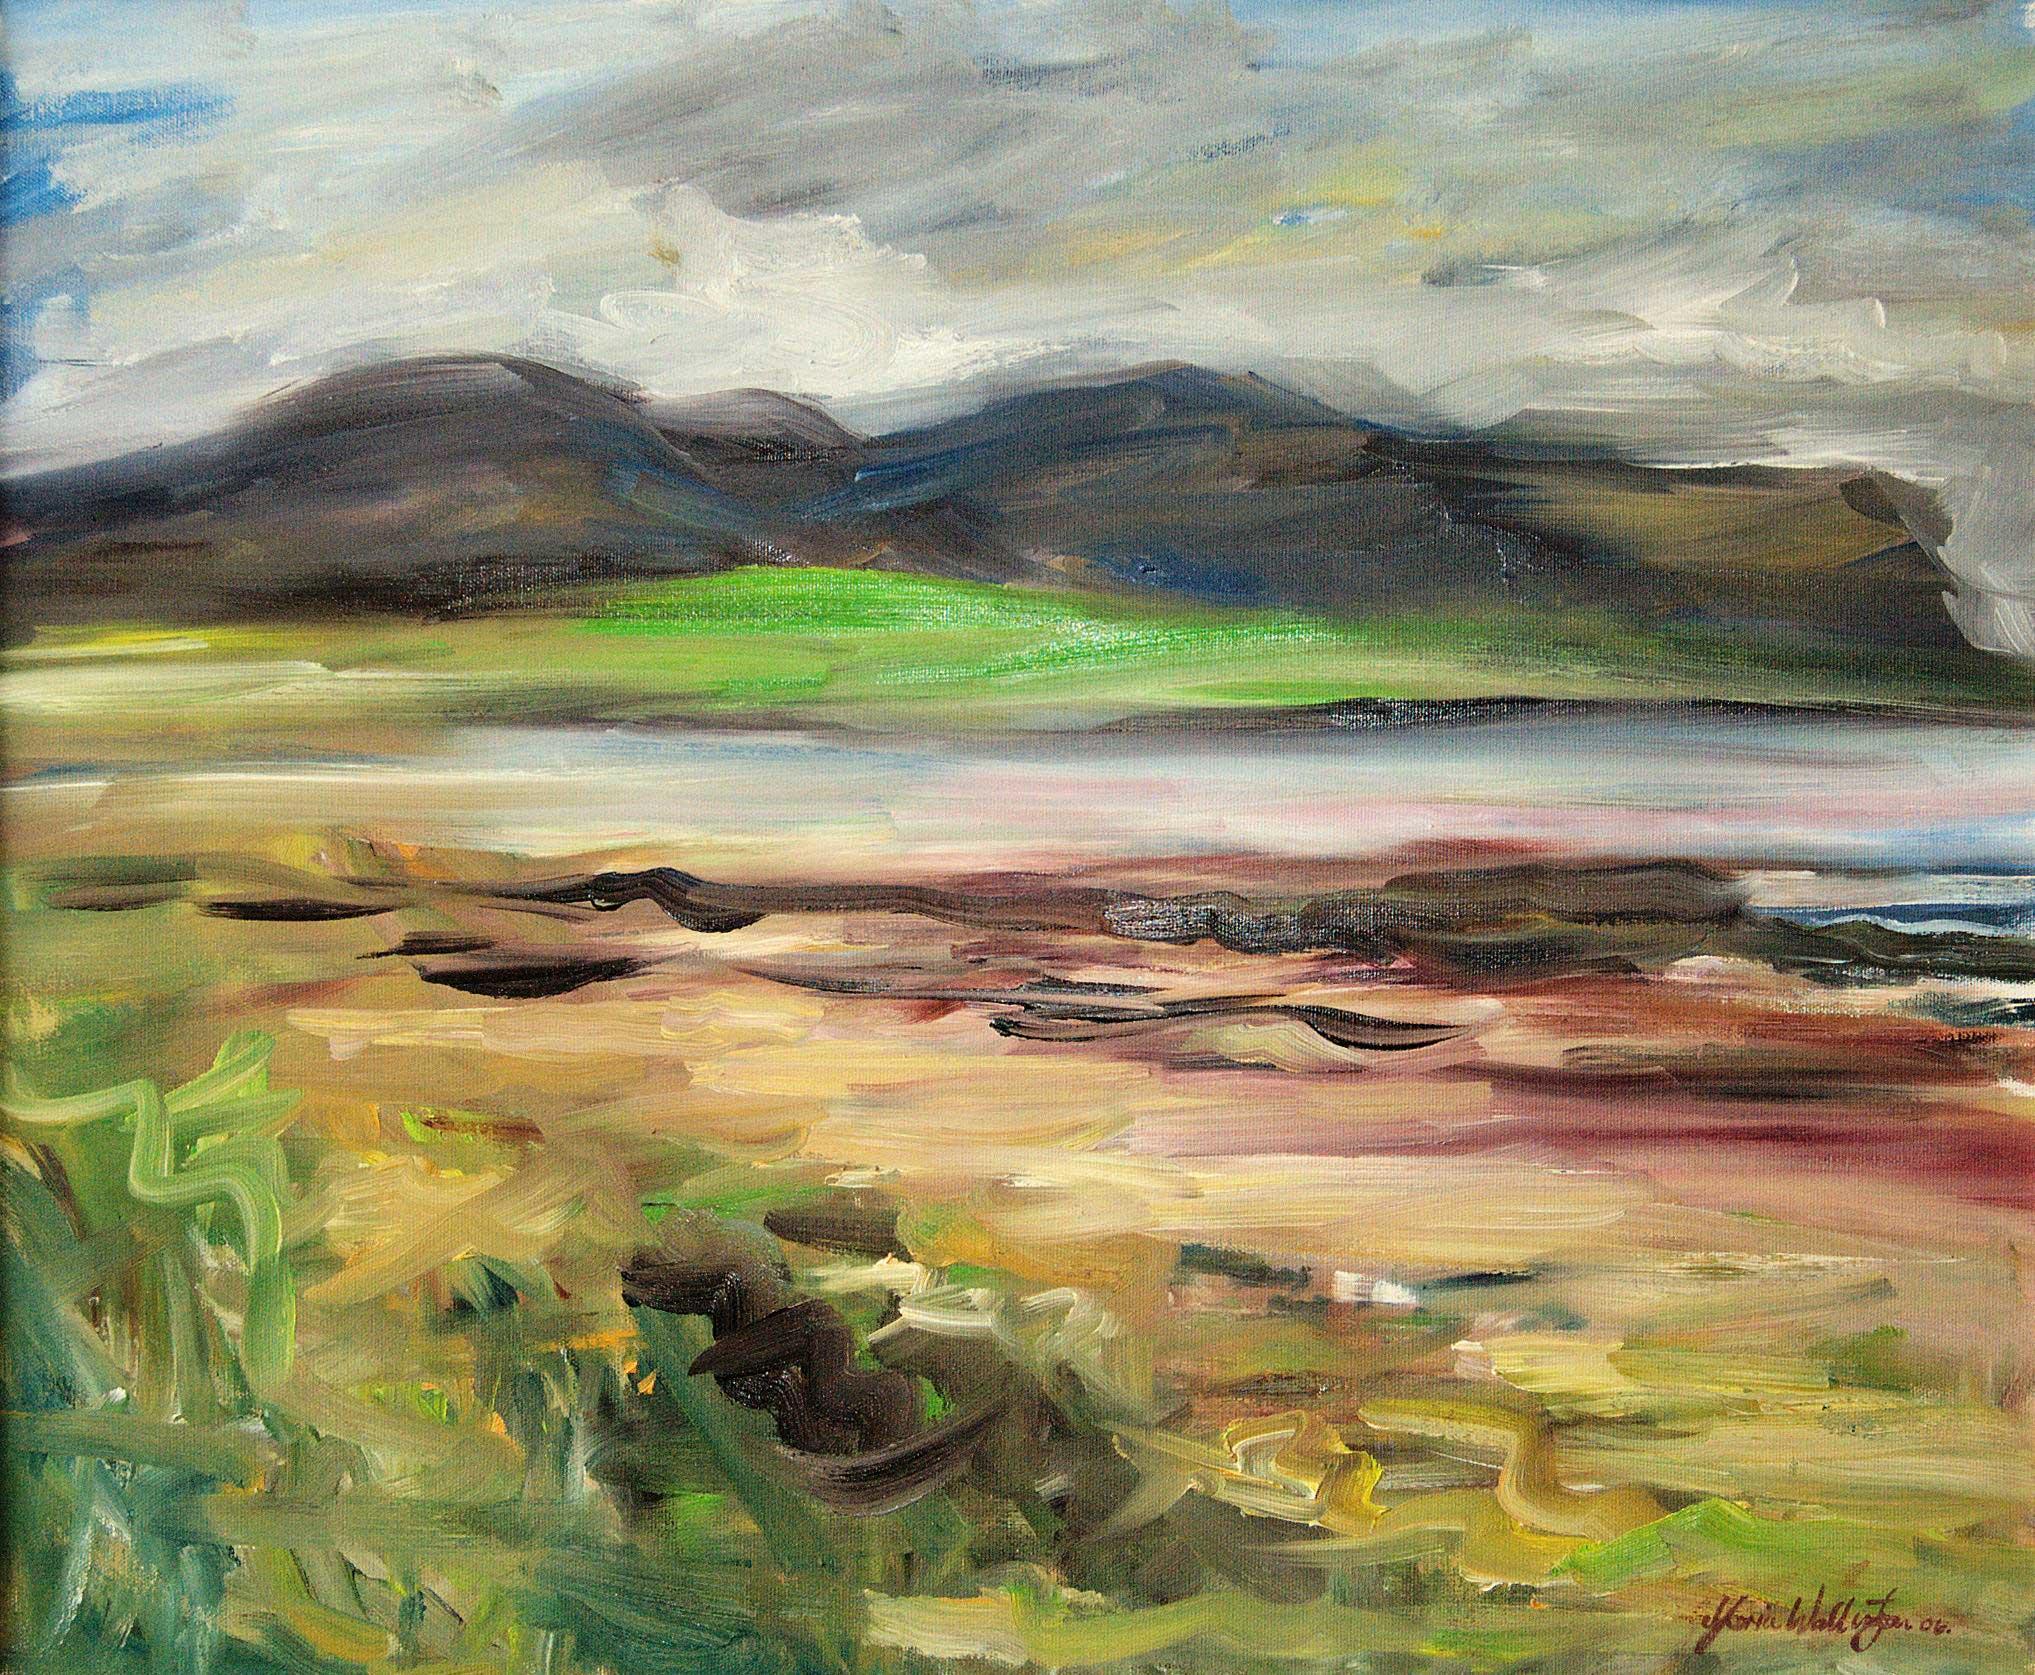 Gloria Wallington, The Green Island of Graemsay, 2016. © the artist